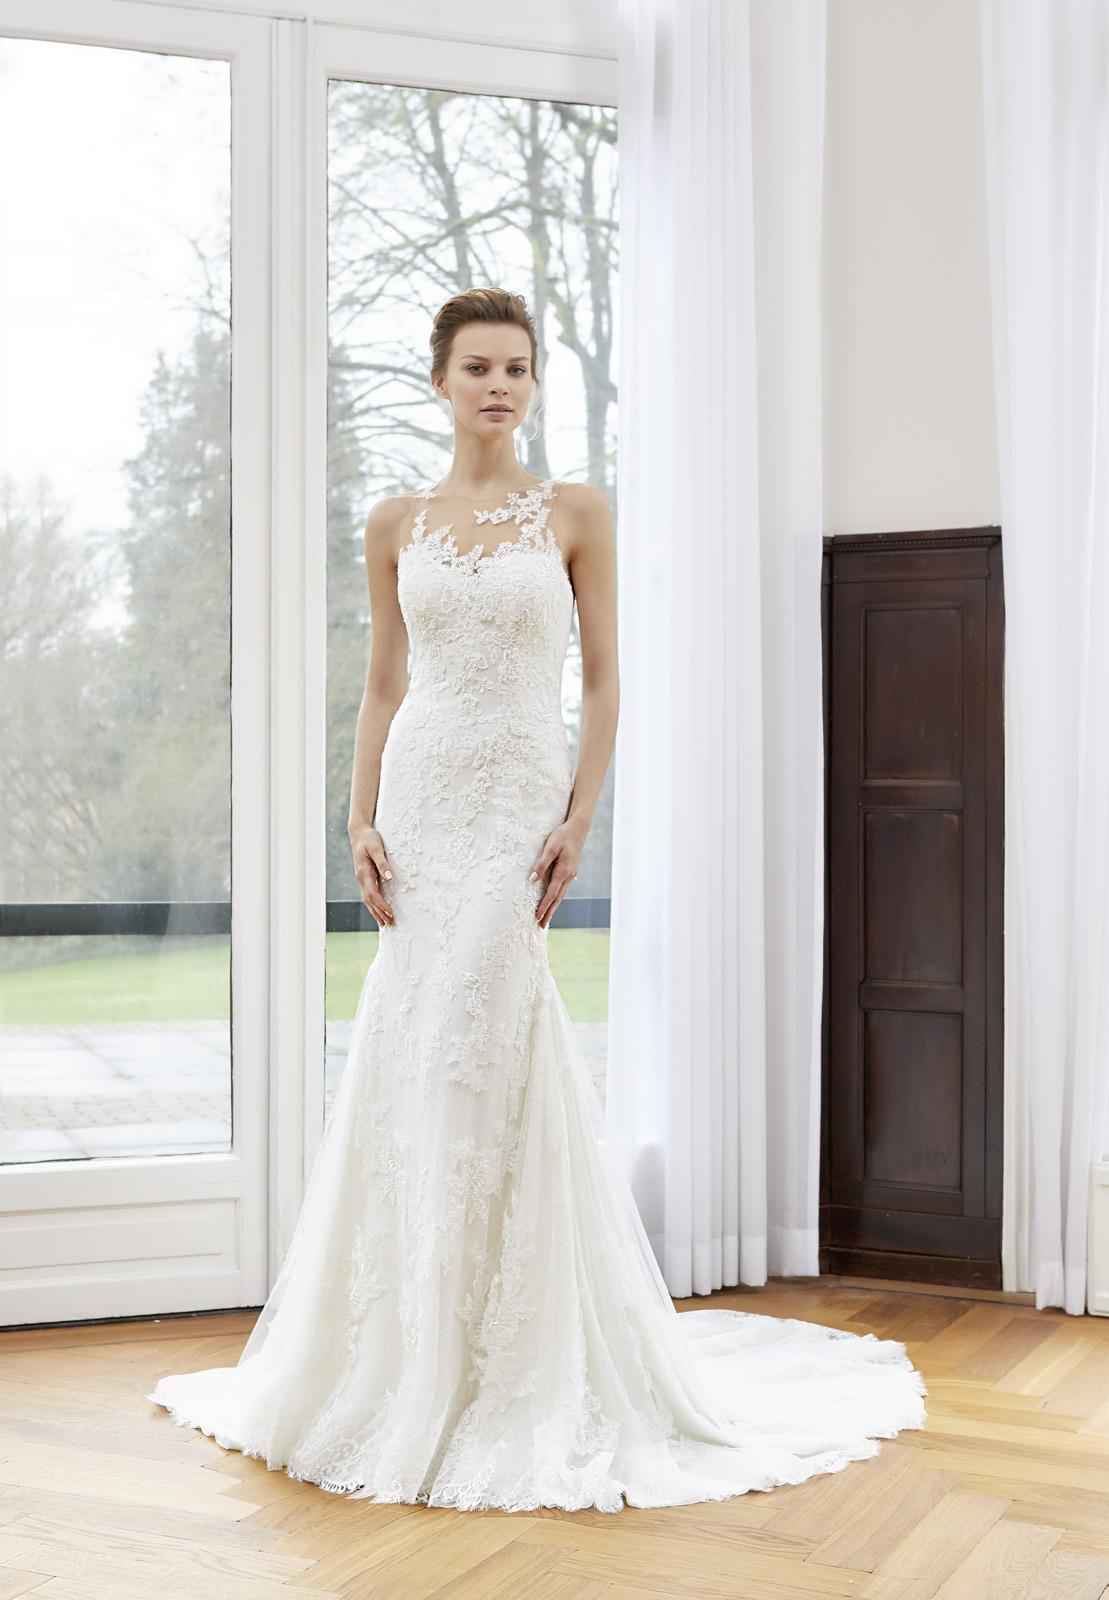 Prijzen modeca trouwjurk